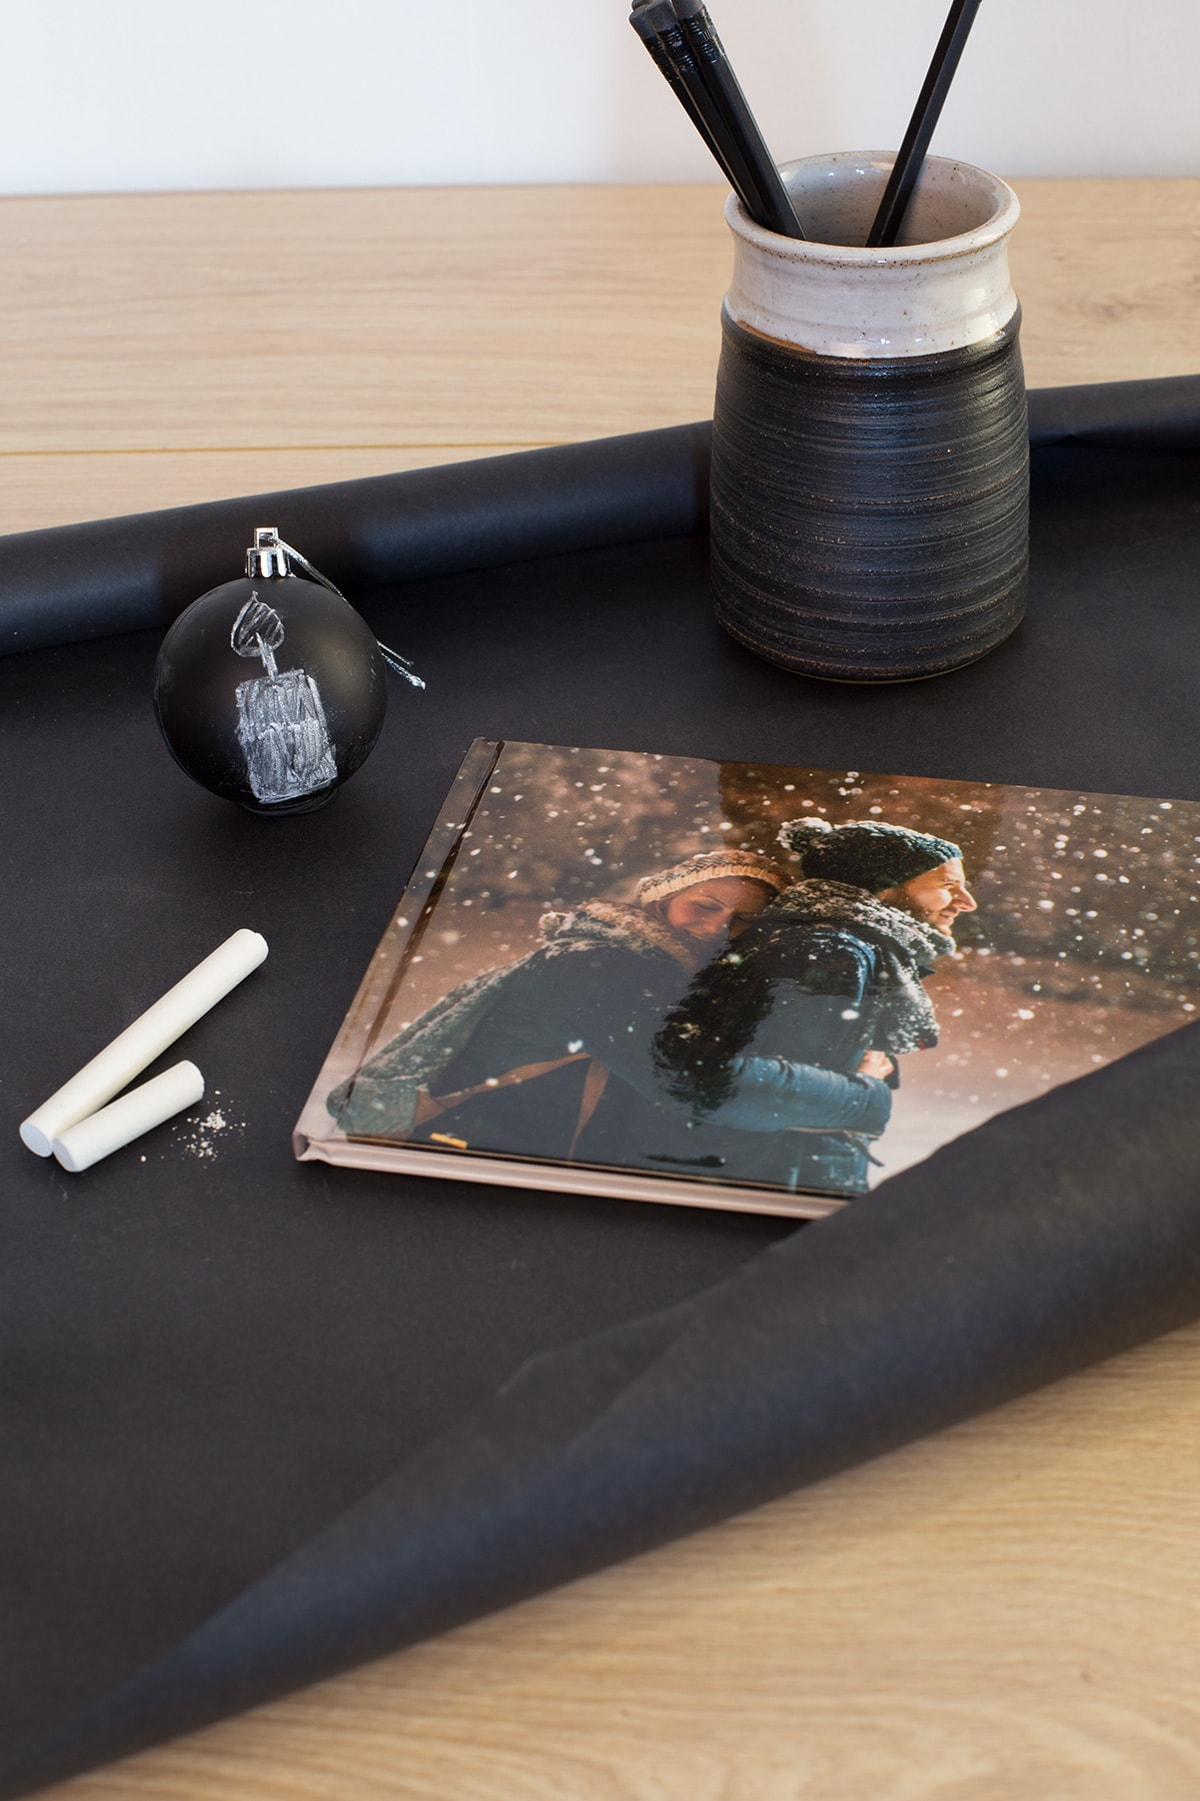 10 kreative ideen zum verpacken deiner geschenke albelli blog. Black Bedroom Furniture Sets. Home Design Ideas